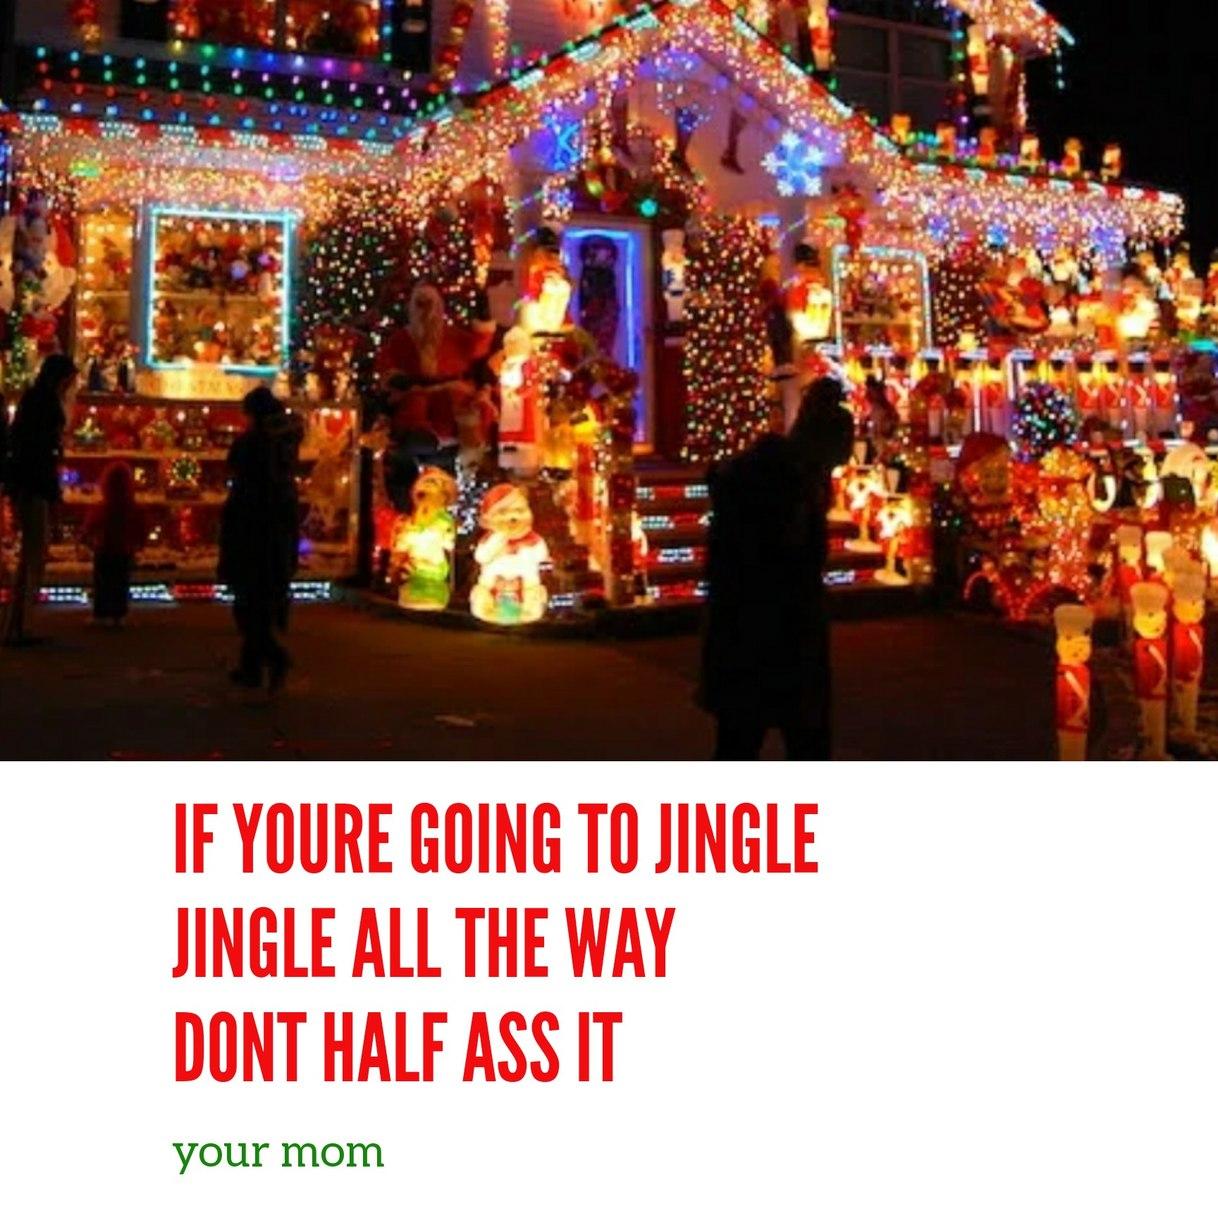 Merry Christmas ya filthy animals - meme